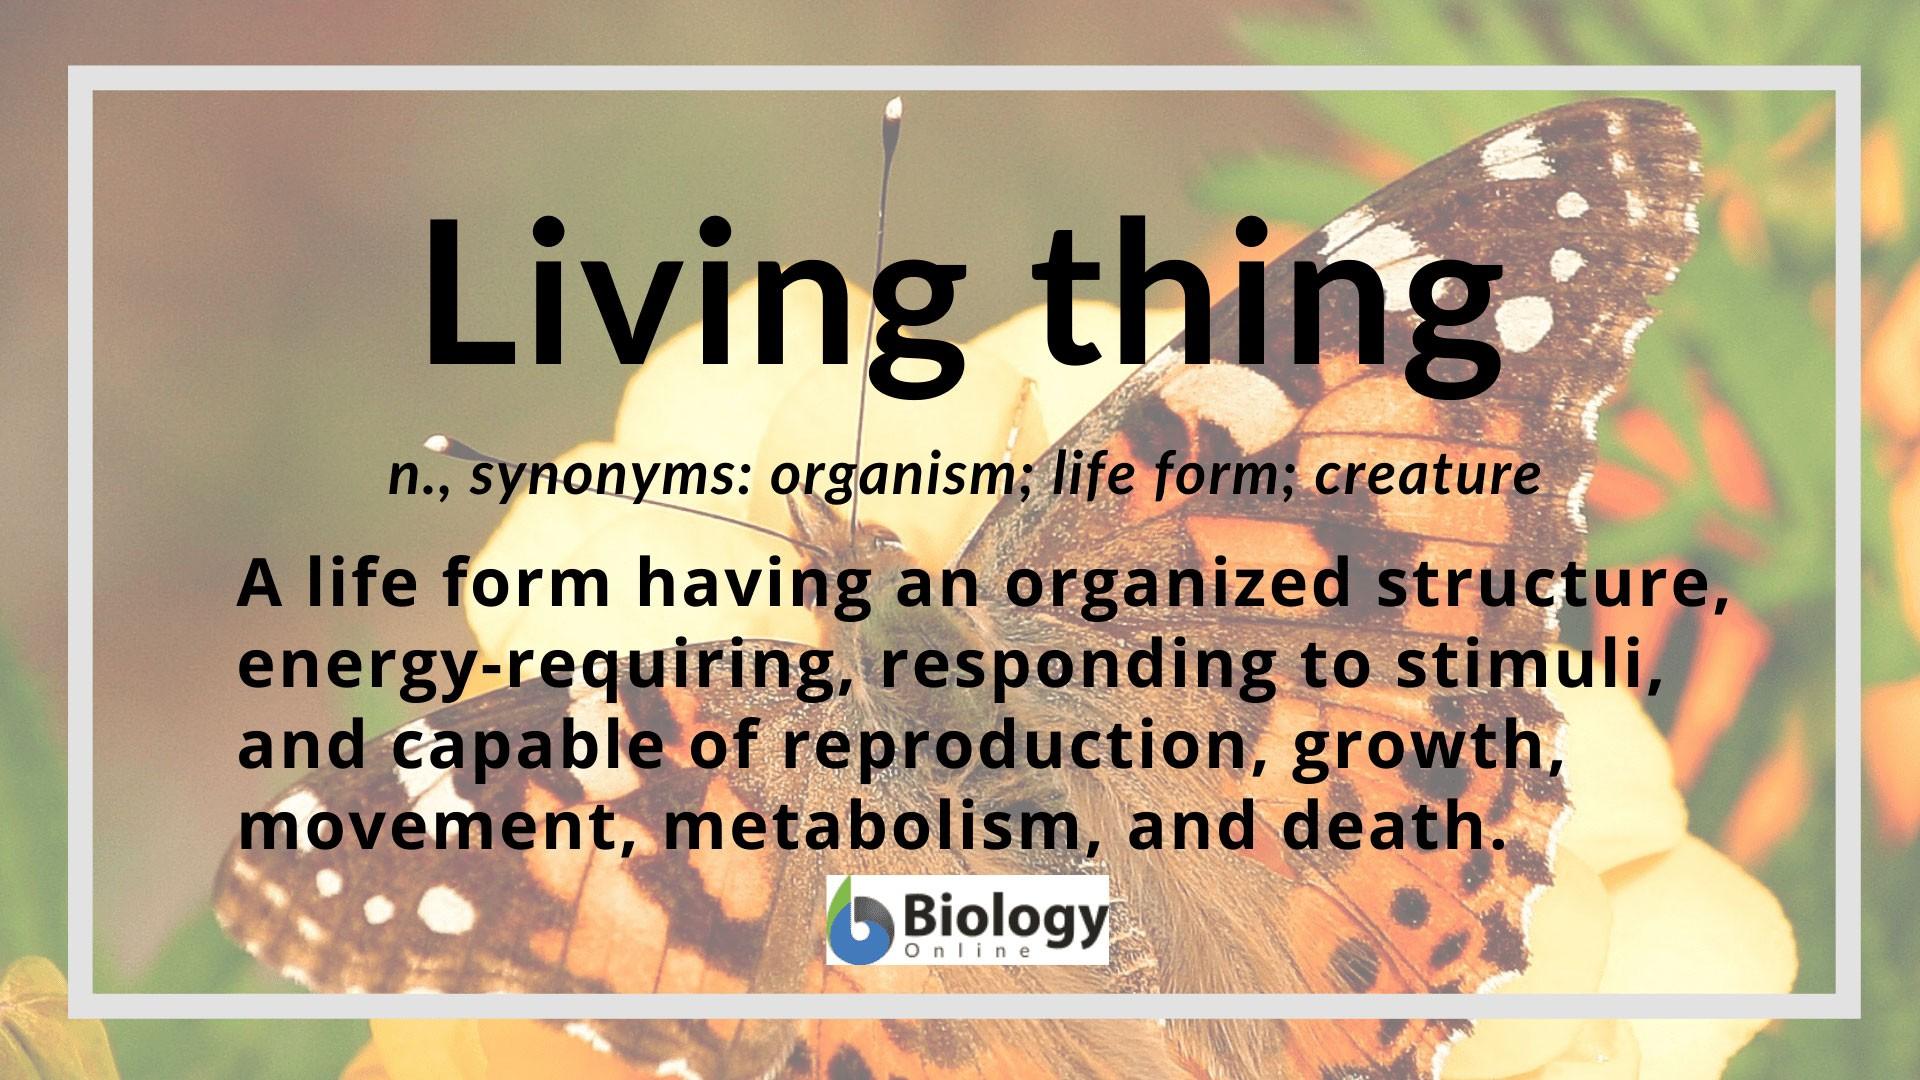 Living Thing